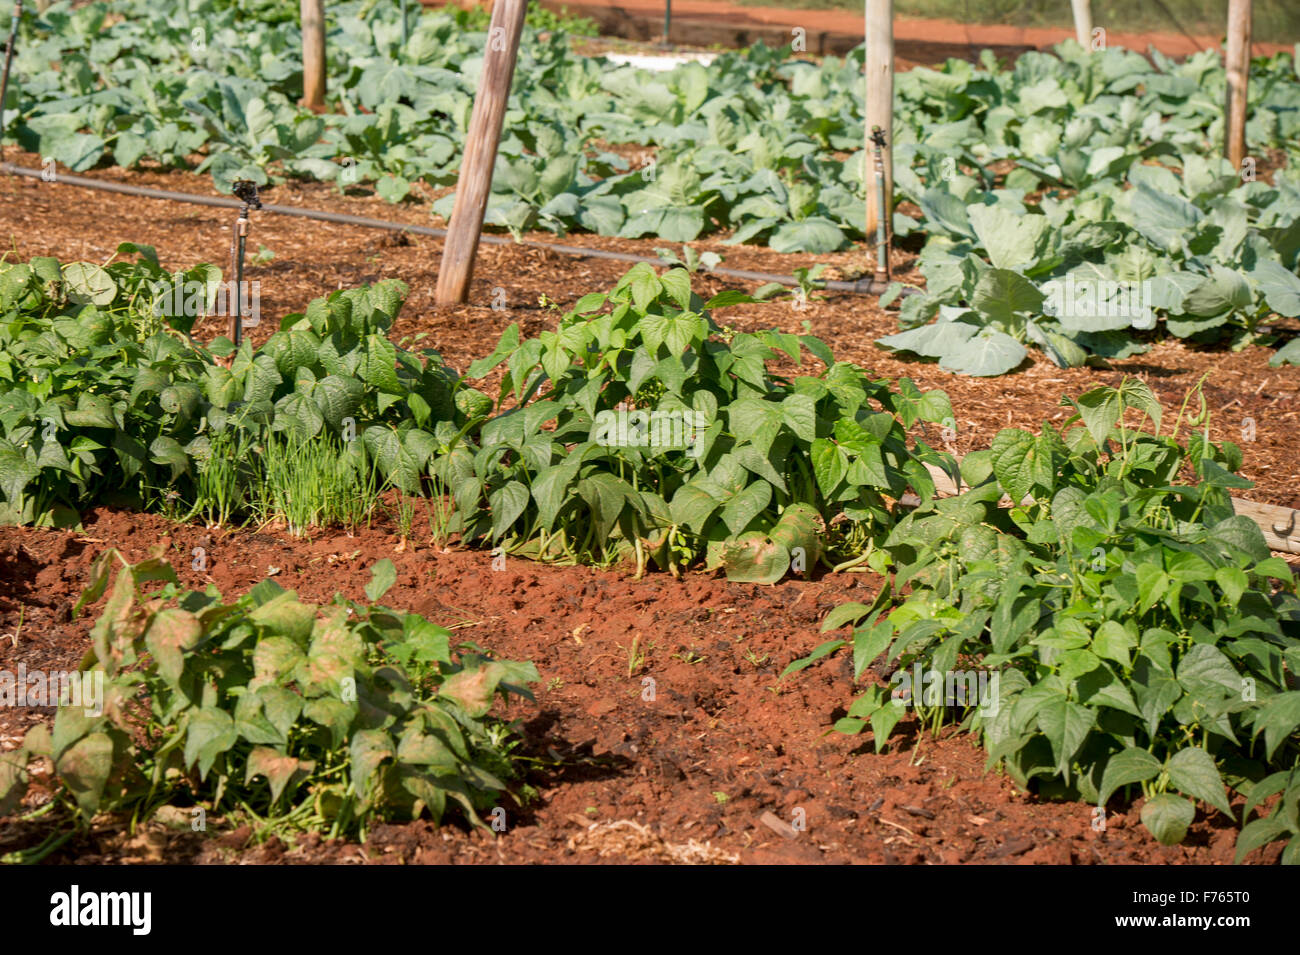 JOHANNESBURG, SOUTH AFRICA- Bean plants growing on farm, - Stock Image